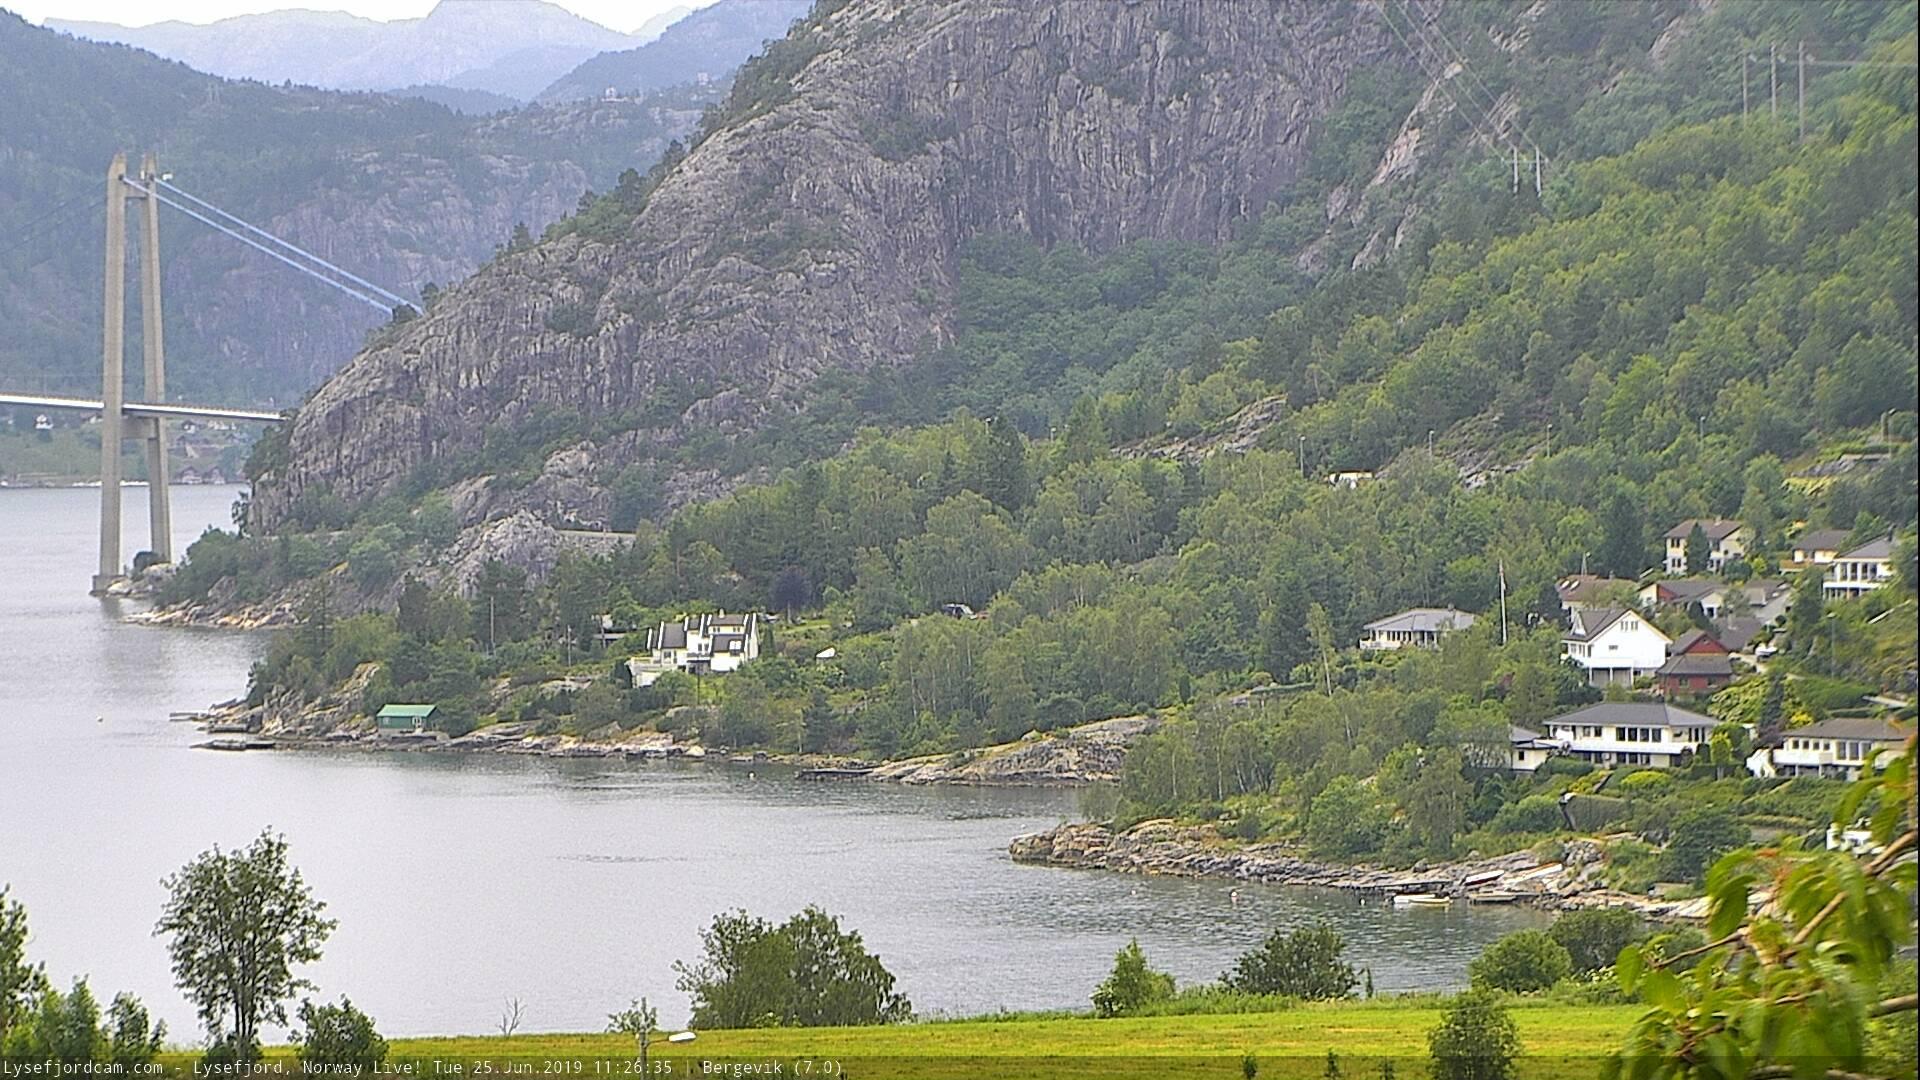 Webkamera Forsand › North: Bergevik: Bergevik